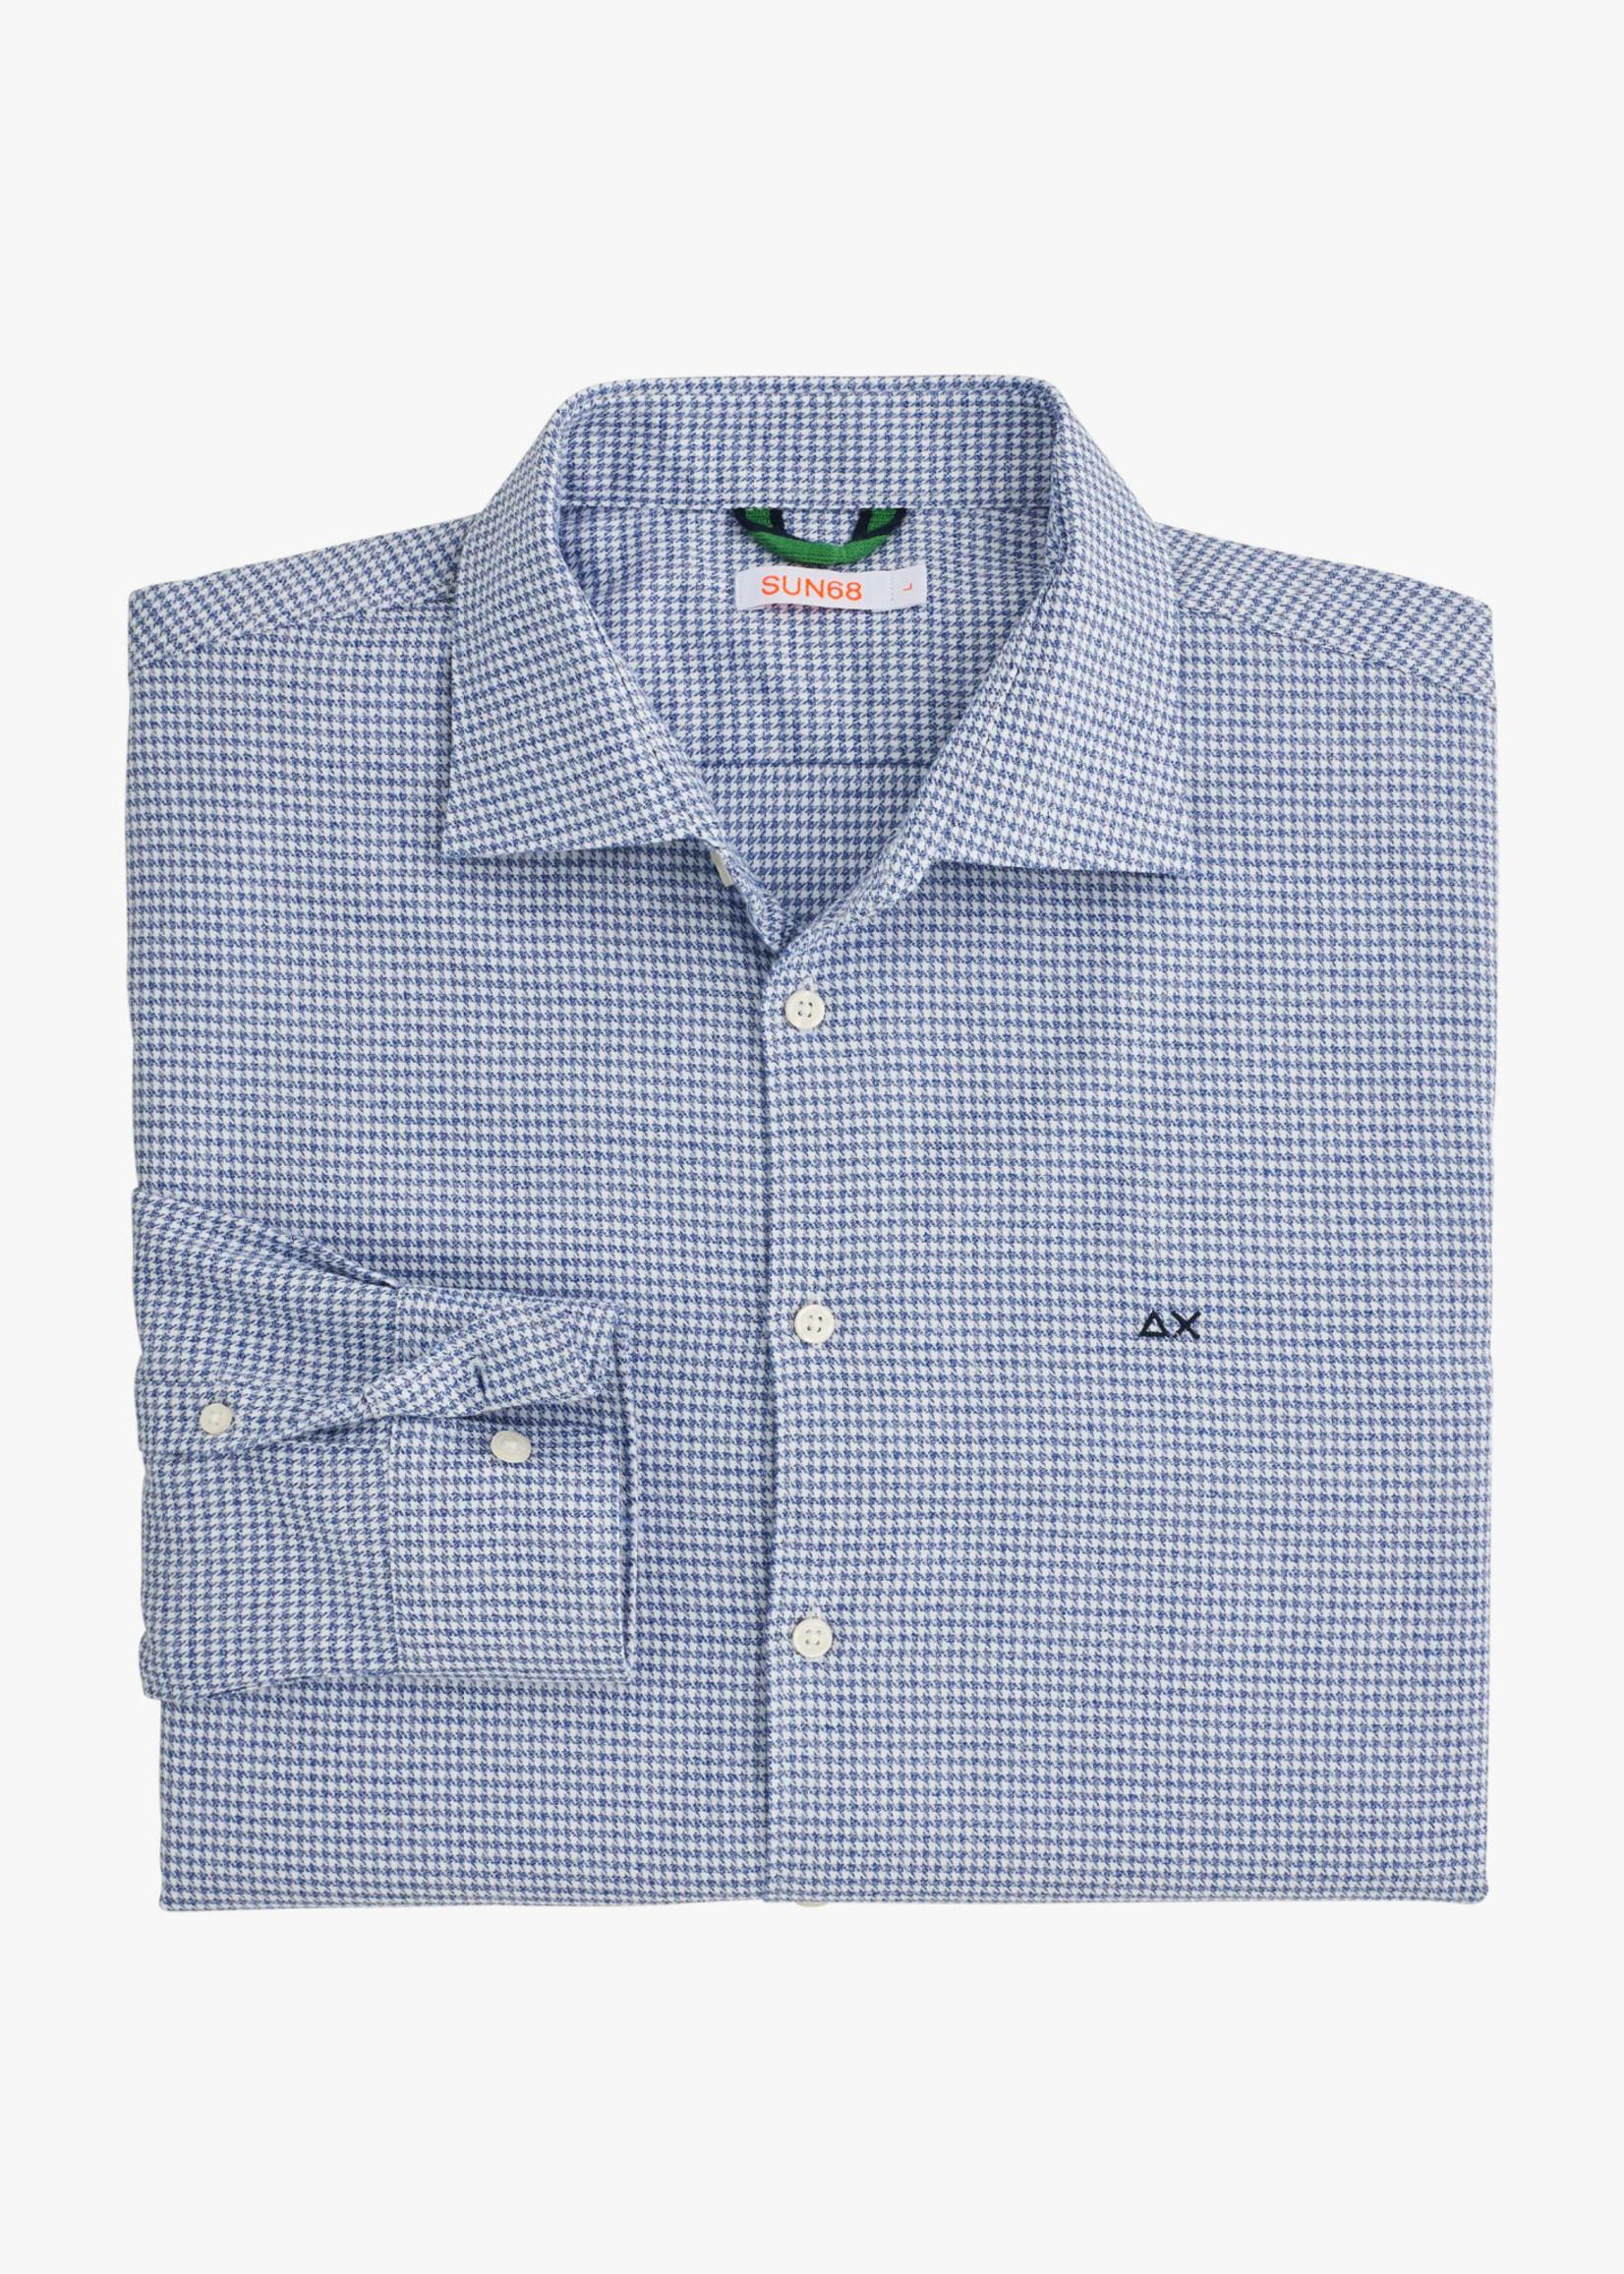 SUN68 Shirt Details French Collar L/S | Light Blue | SUN68